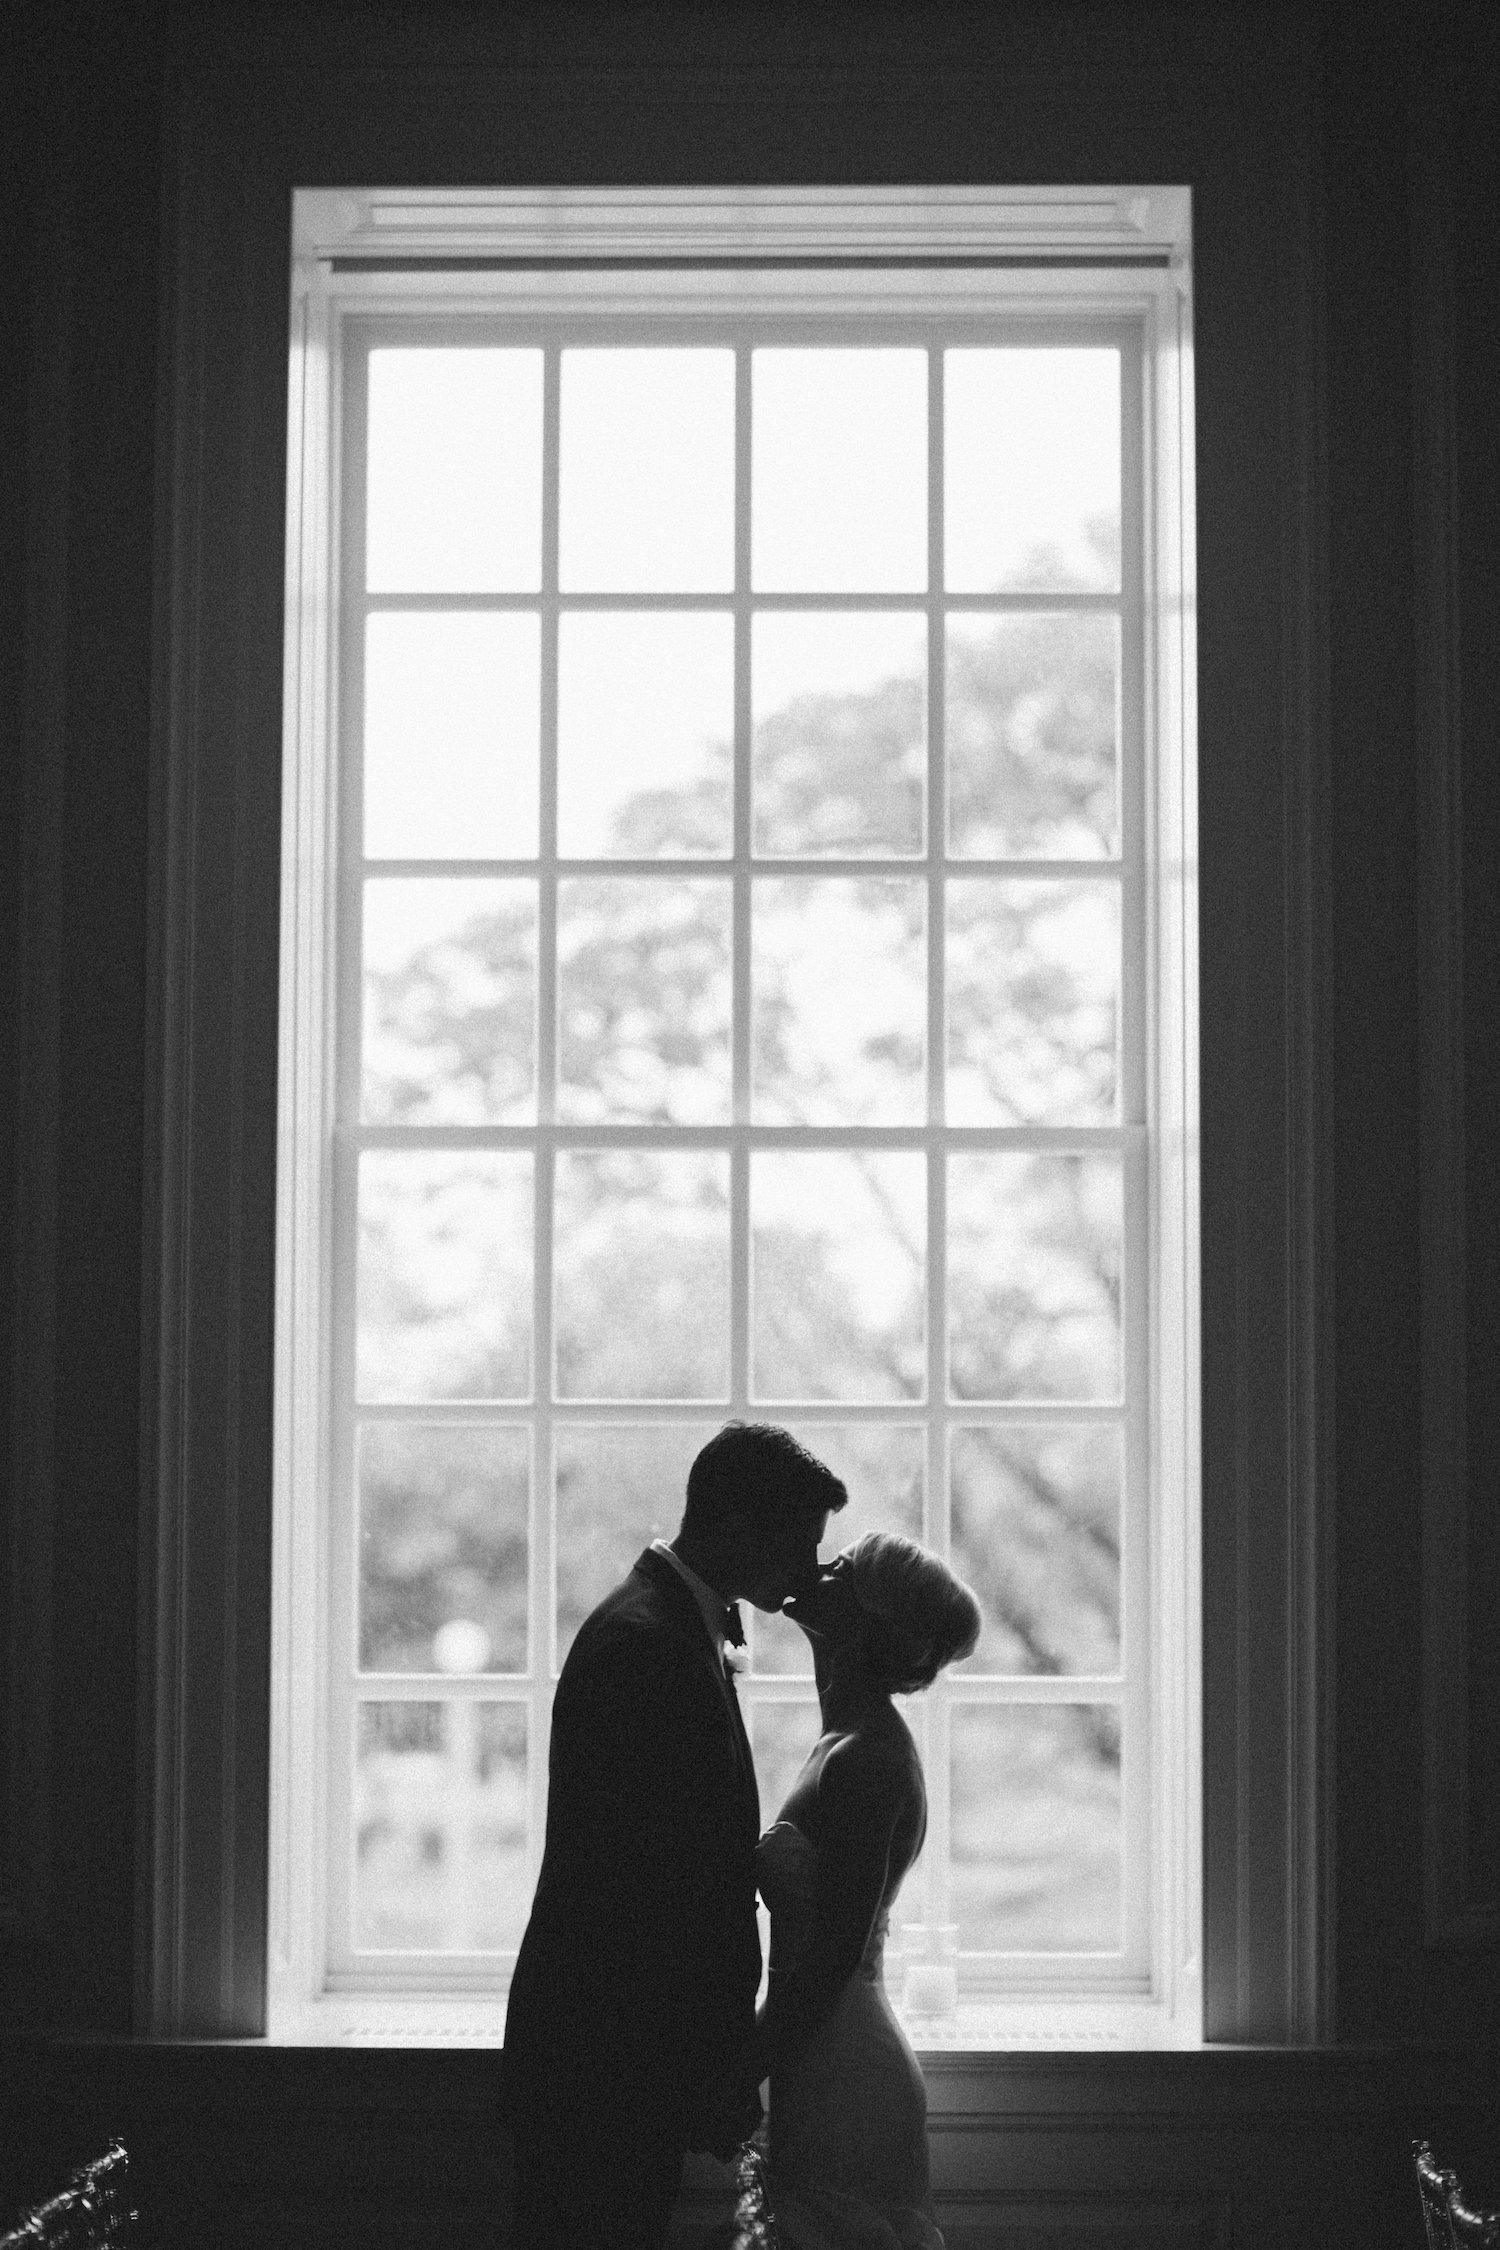 chicago-history-museum-wedding-06.jpg